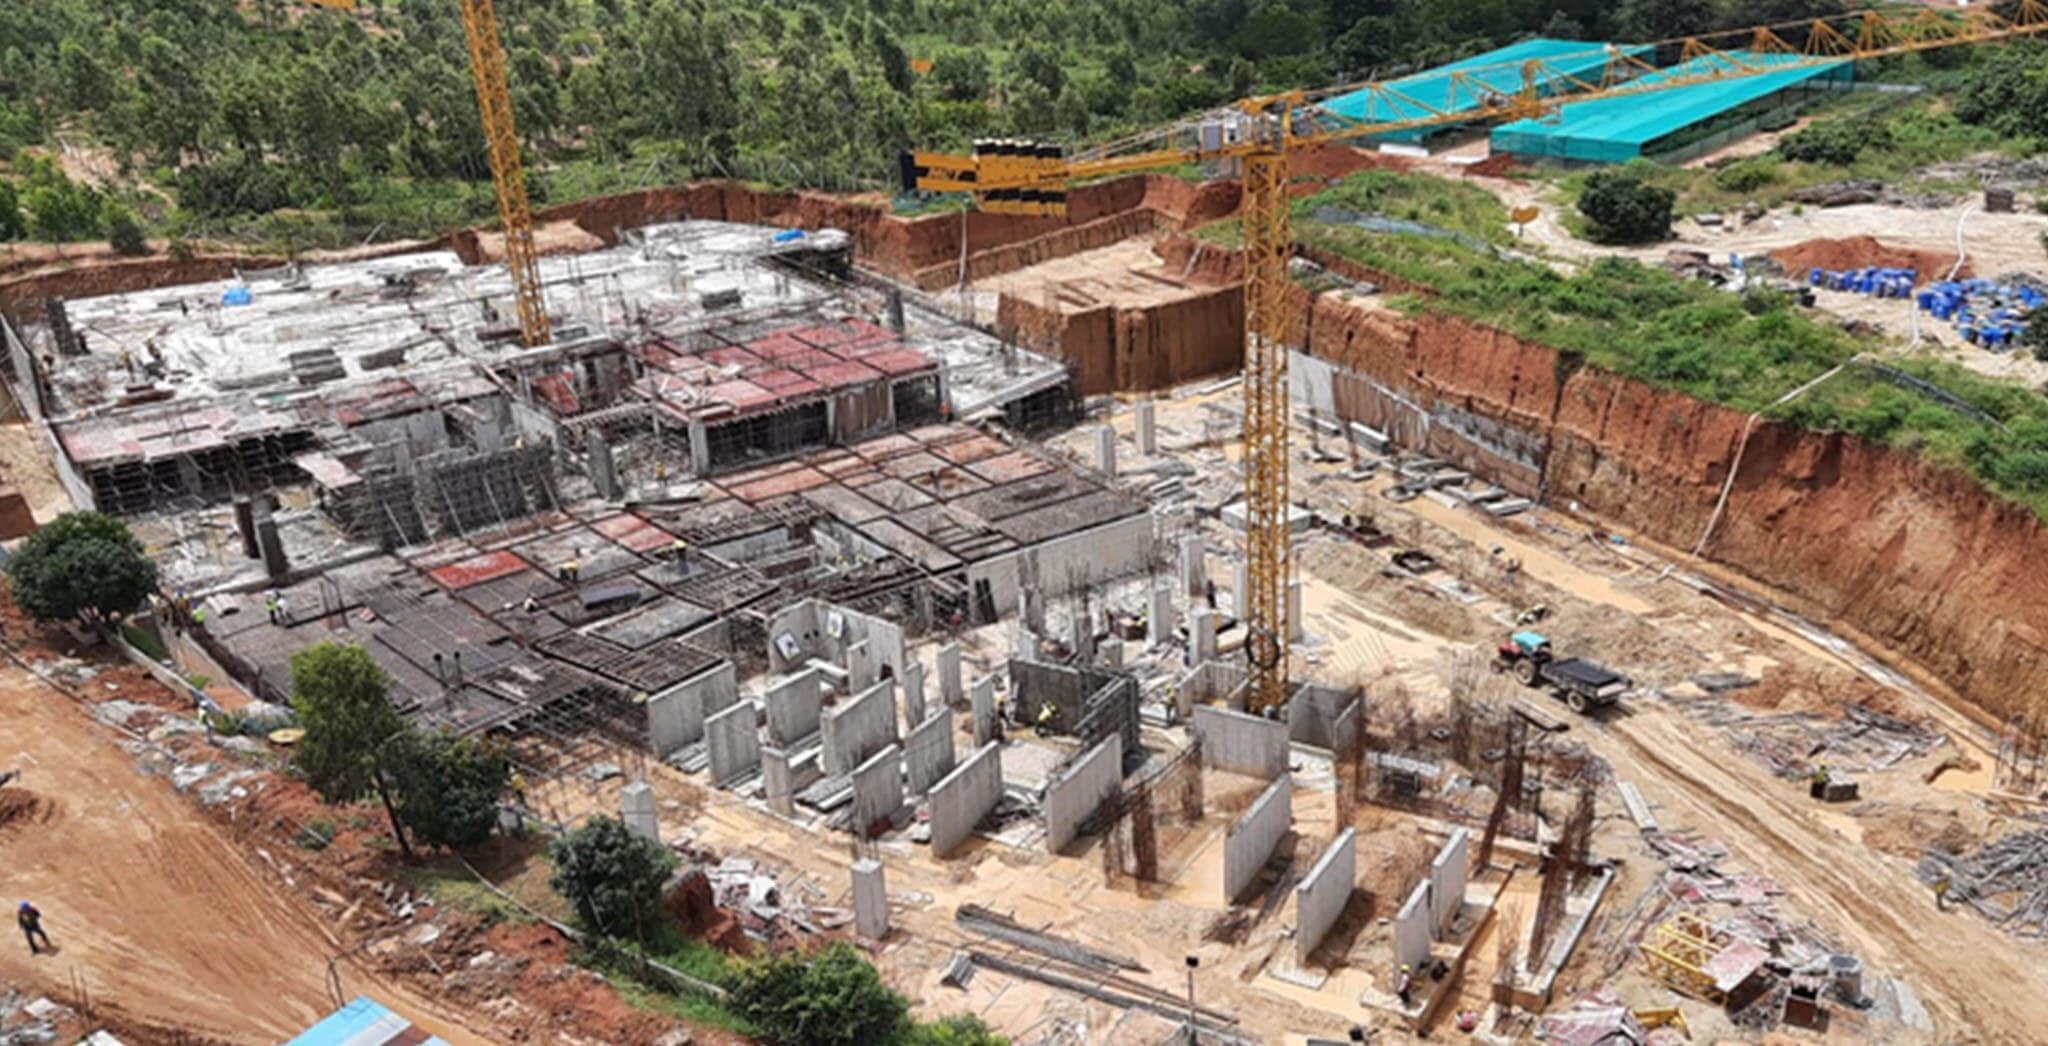 Sep 2020 - Halcyon: Tower I Basement-02—floor slab 100% completed; Tower I Basement-01—floor slab  50% completed; Tower J Basement-02—floor slab work-in-progress